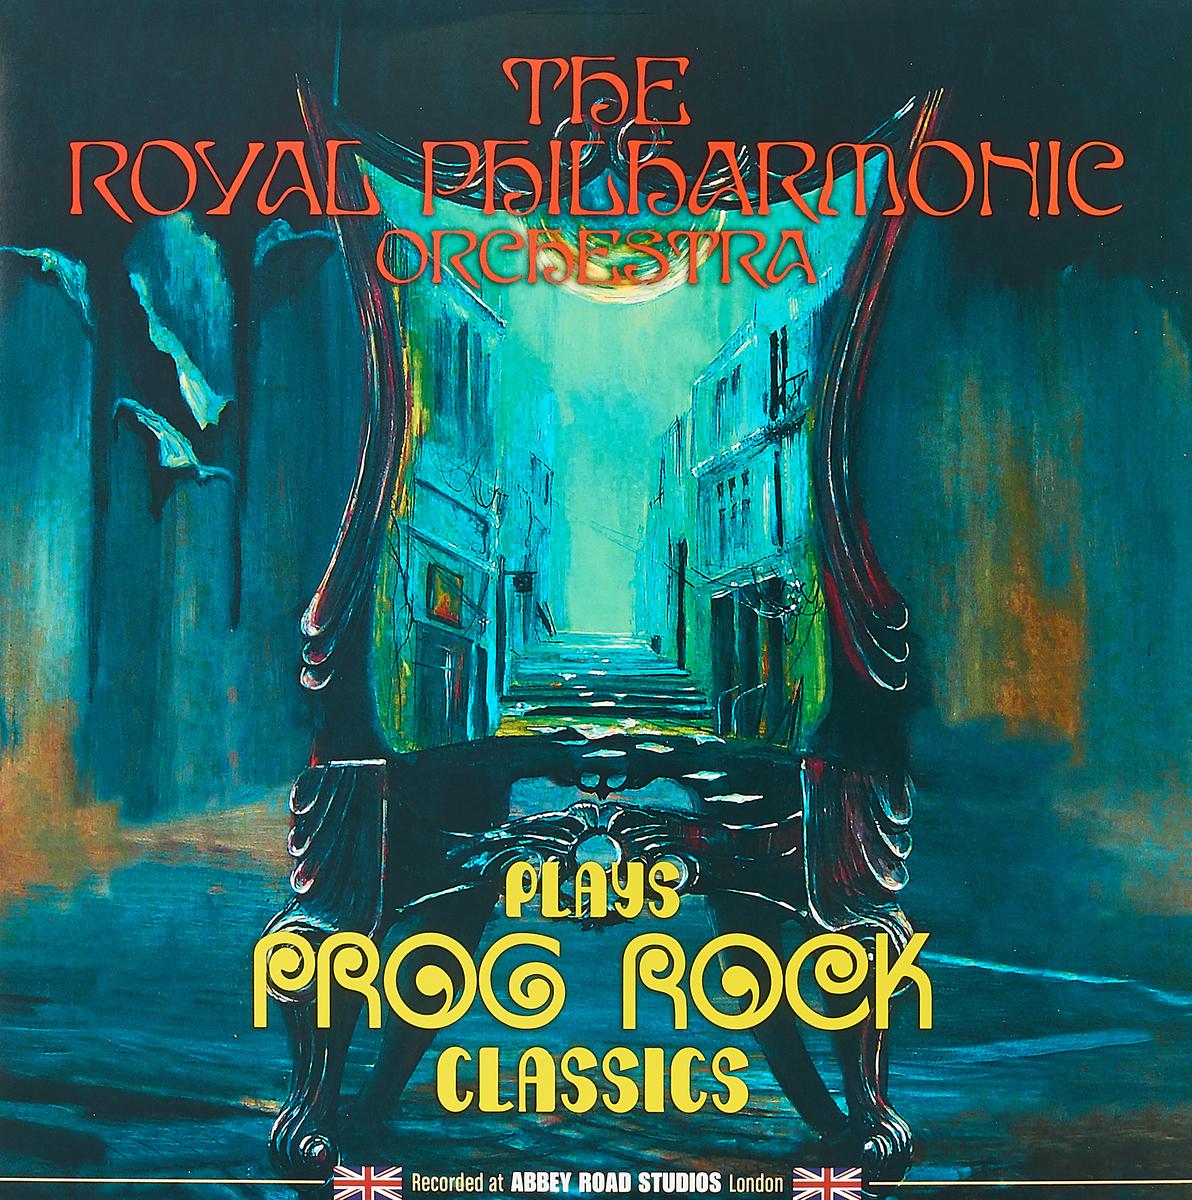 лучшая цена The Royal Philharmonic Orchestra The Royal Philharmonic Orchestra. Plays Prog Rock Classics (LP)